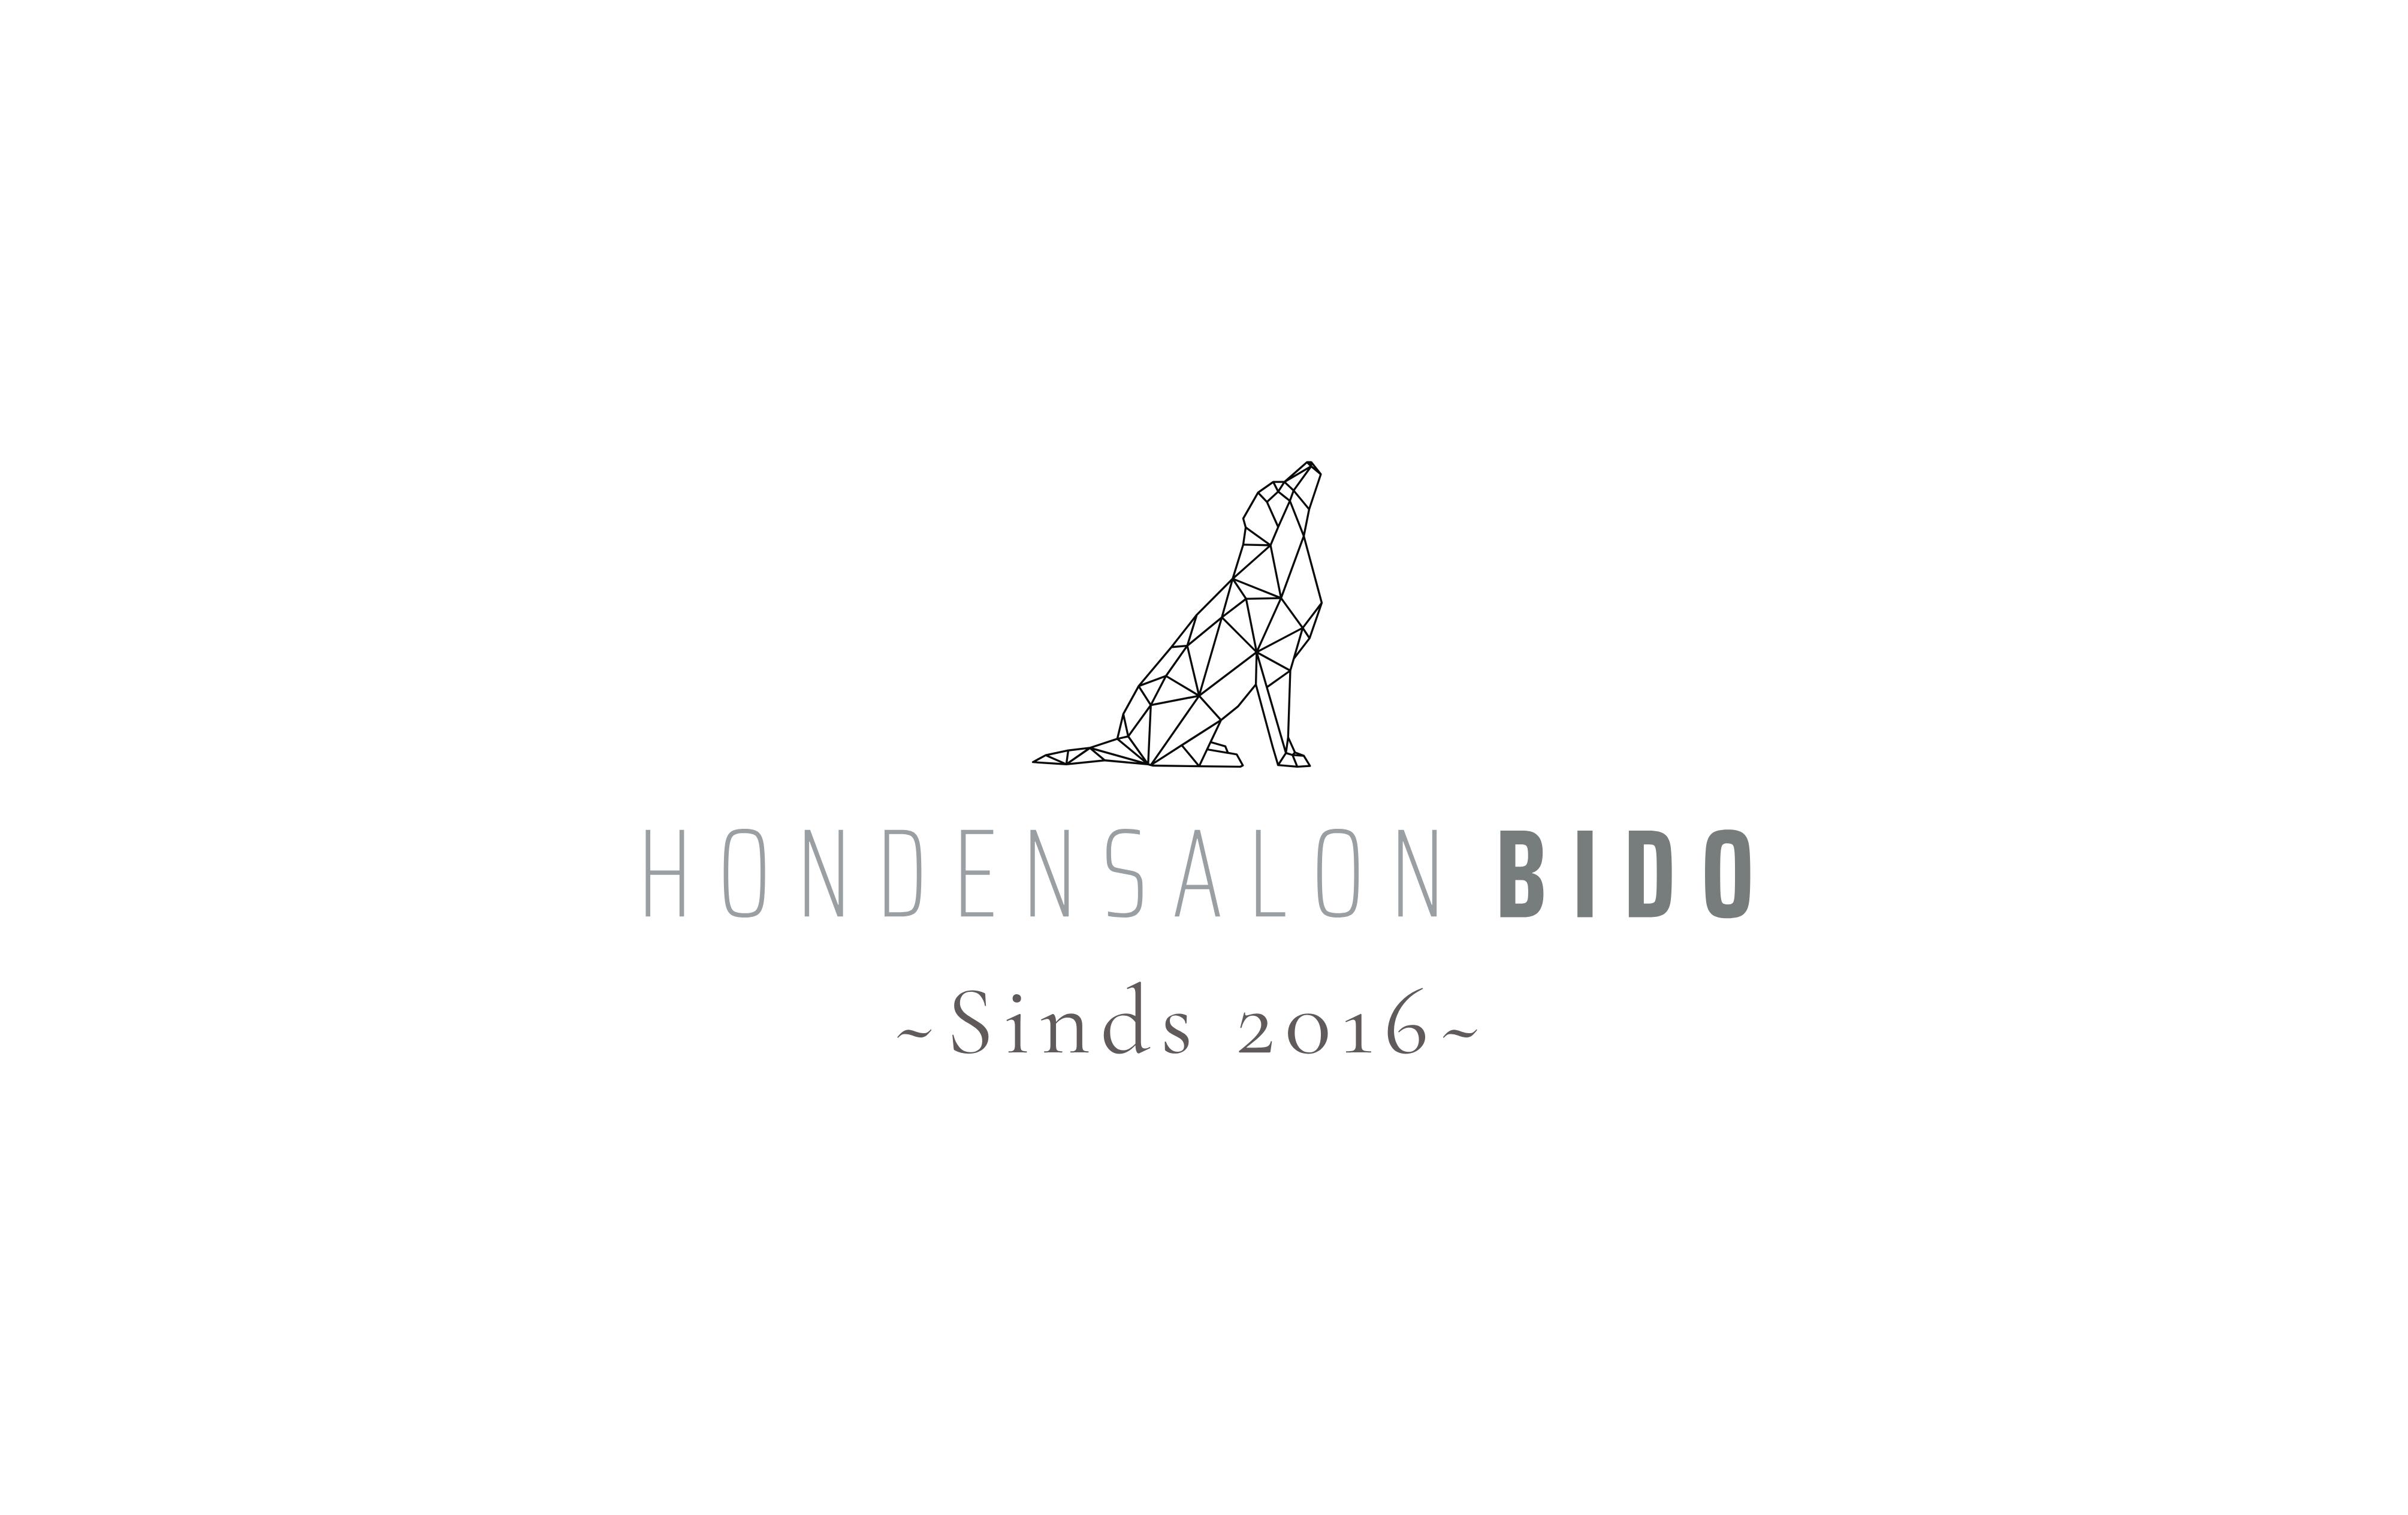 Hondensalon BiDo